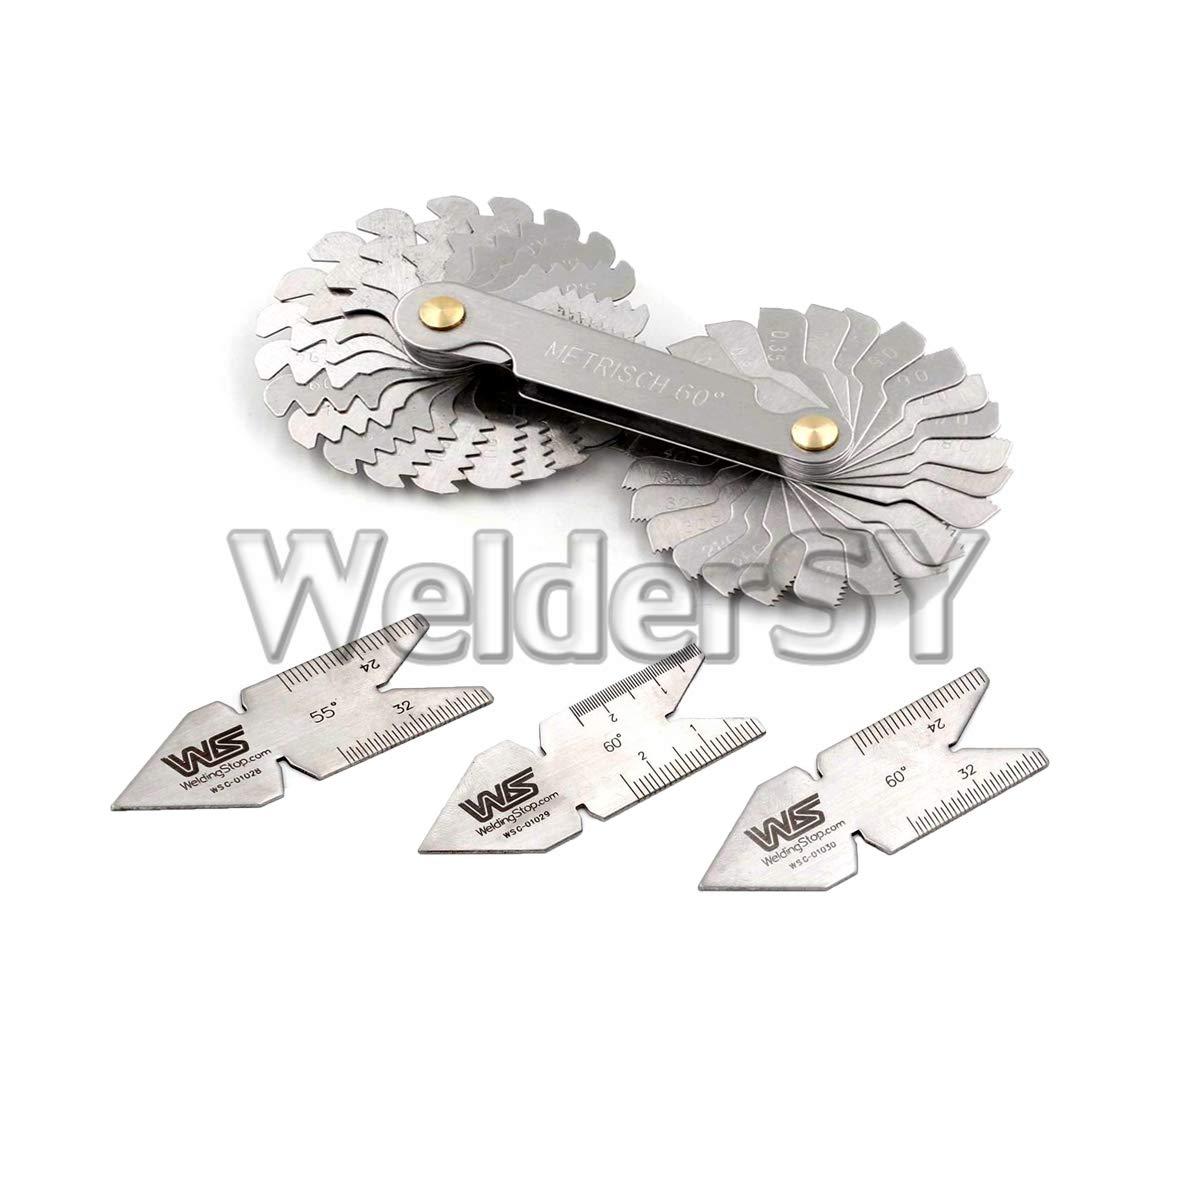 4Pcs Screw Thread Pitch Cutting Gauge Tool Set Centre Gage 55°/&60° Inch /& Metric